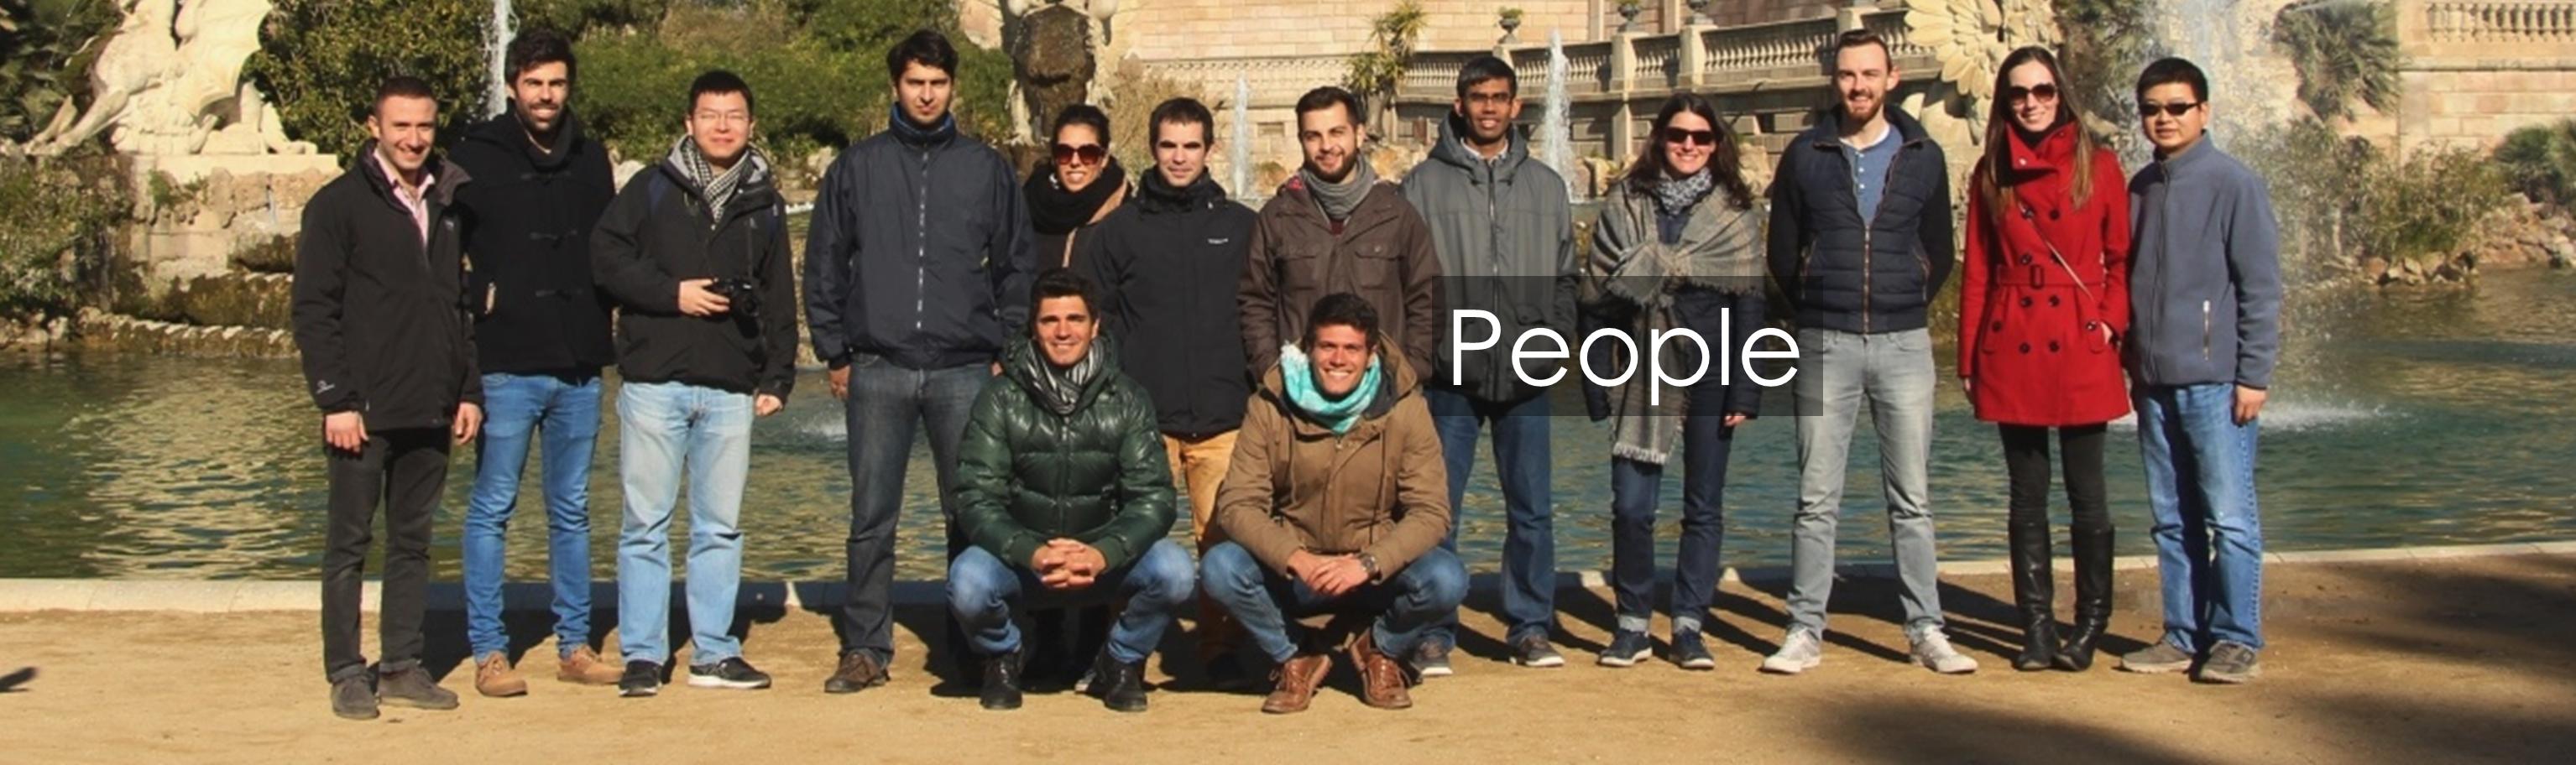 People7